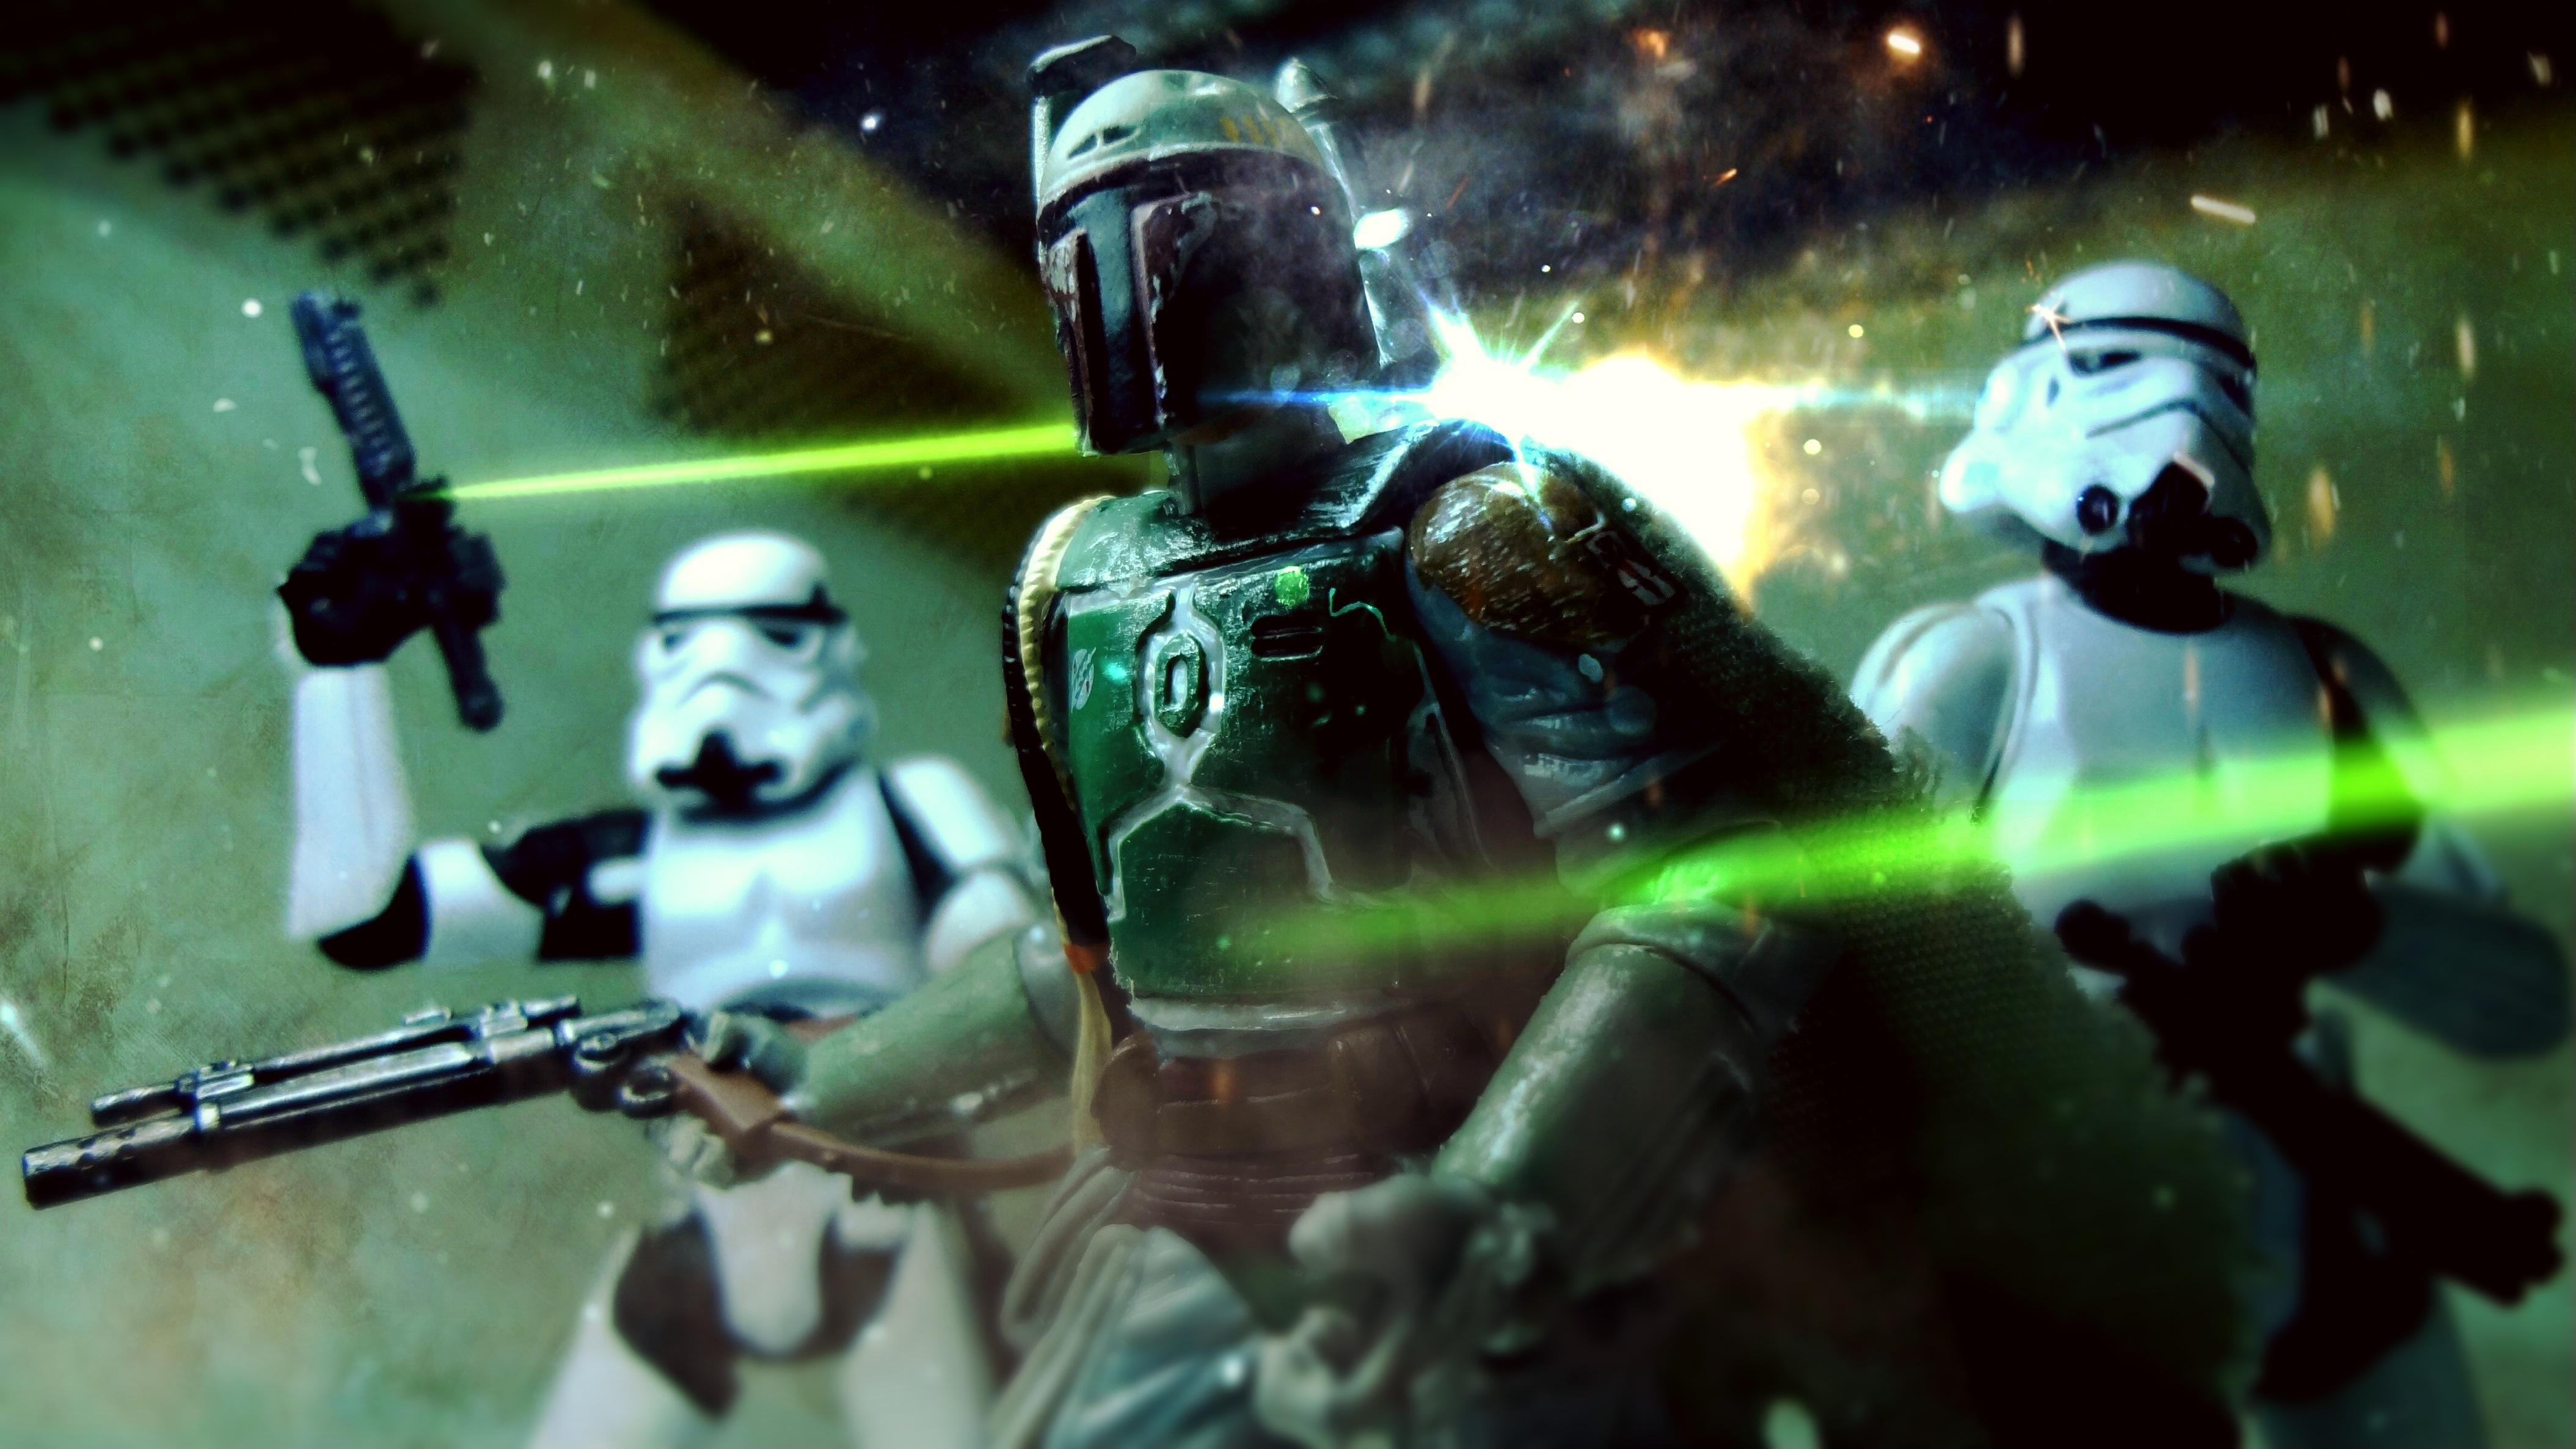 Toy Photography Star Starwars Stormtroopers Stormtrooper Wars Sisi Hasbro Fett